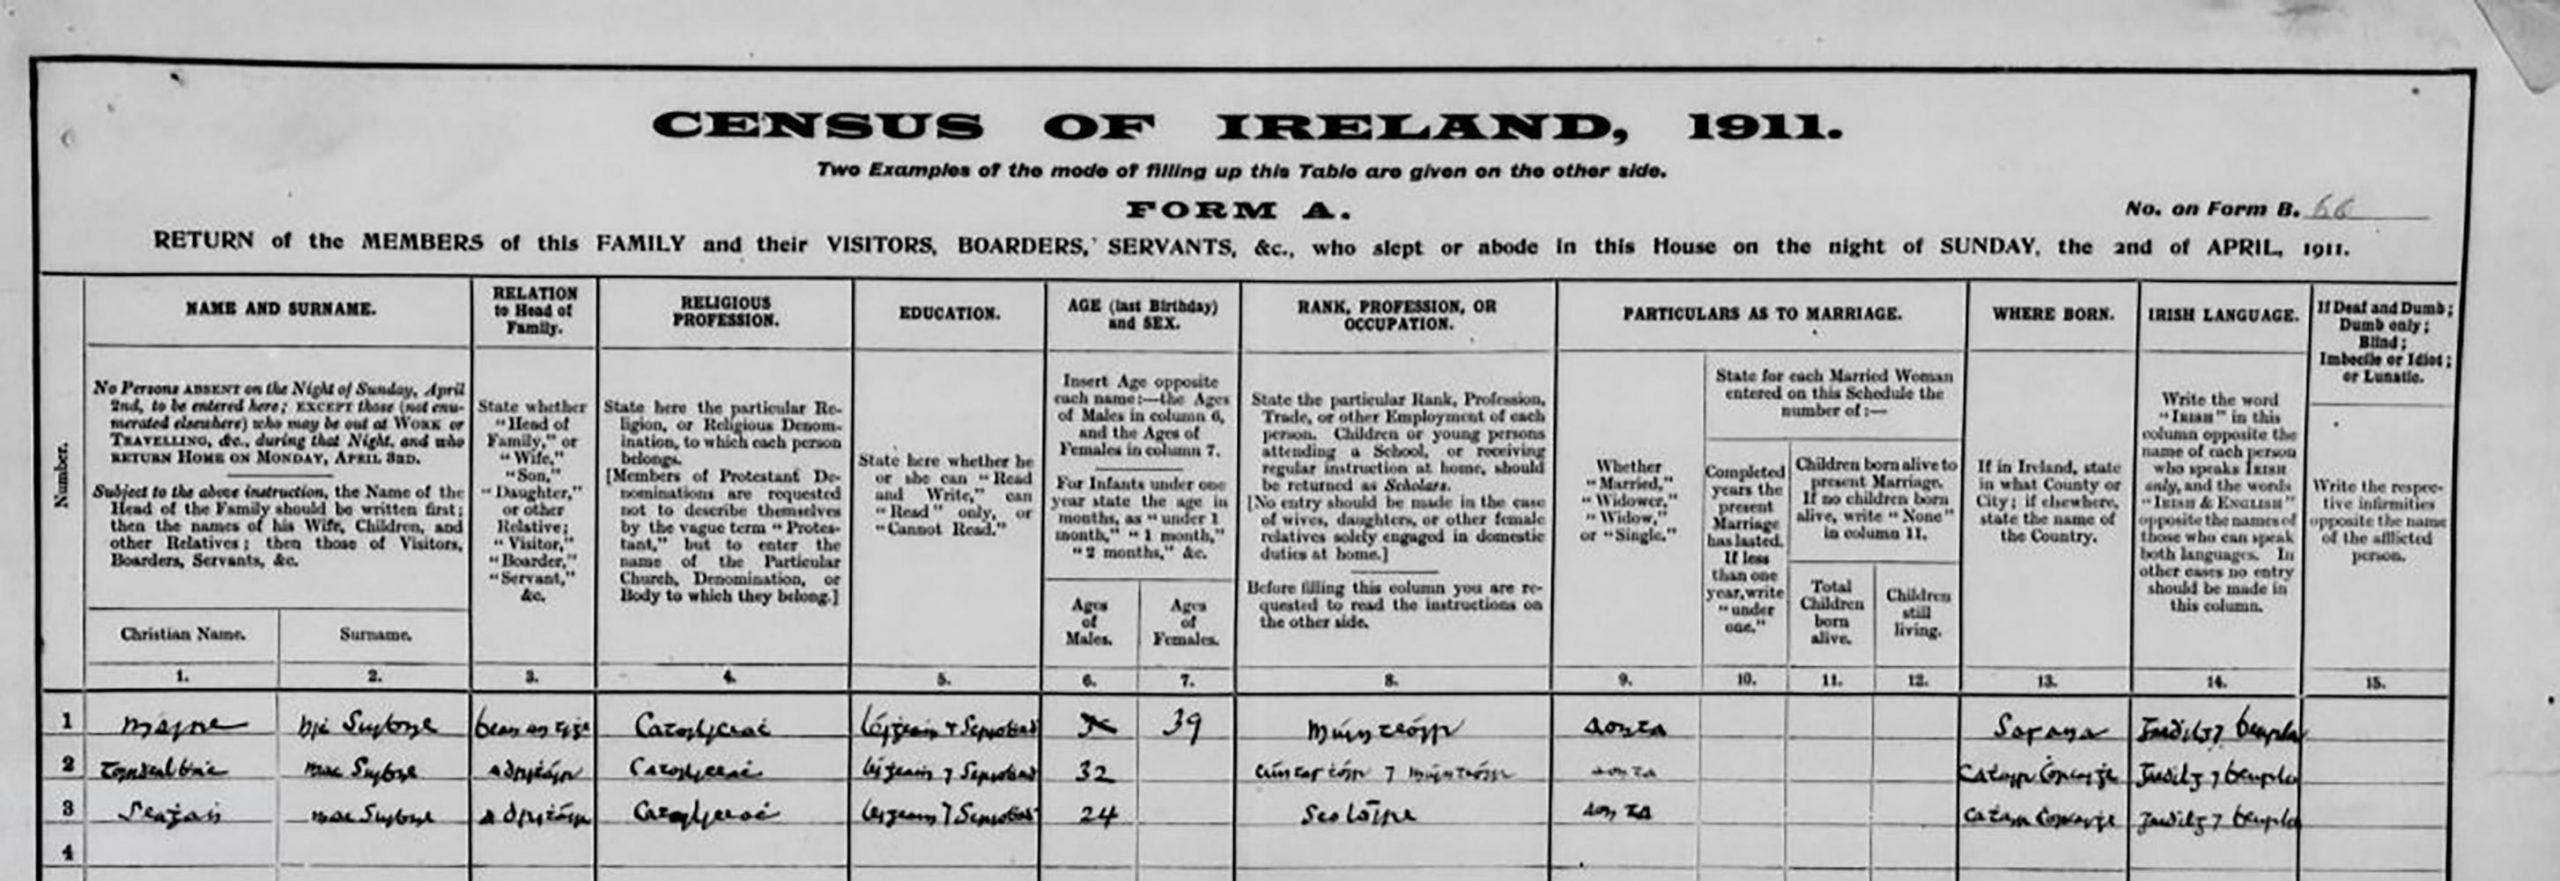 Mary MacSwiney 1911 Census Return